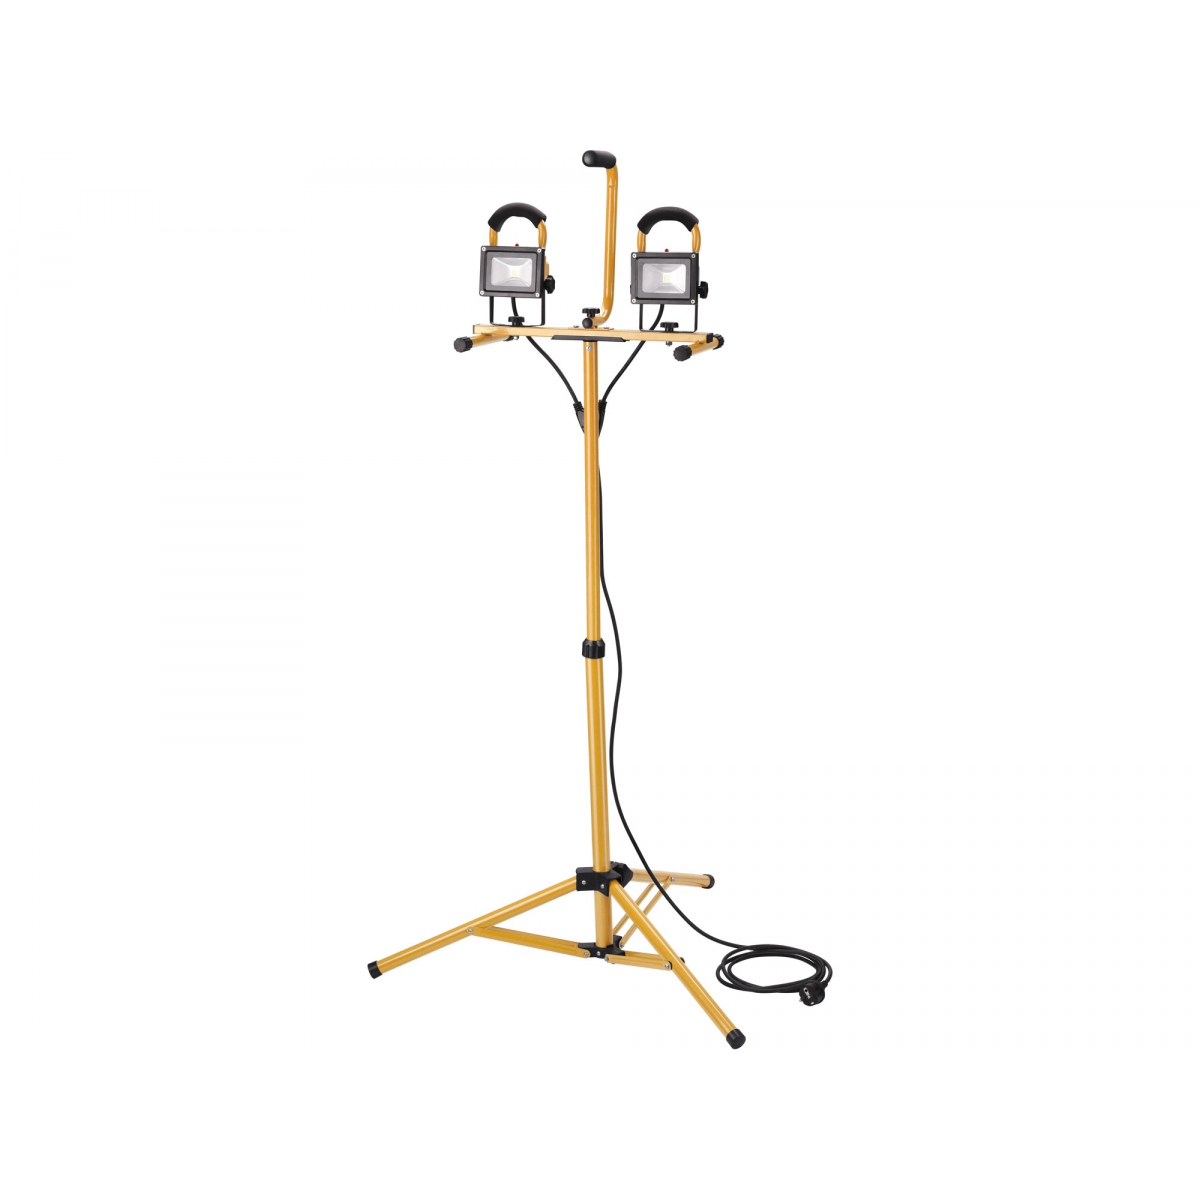 Reflektor LED, 2x800lm, so stojanom 125cm